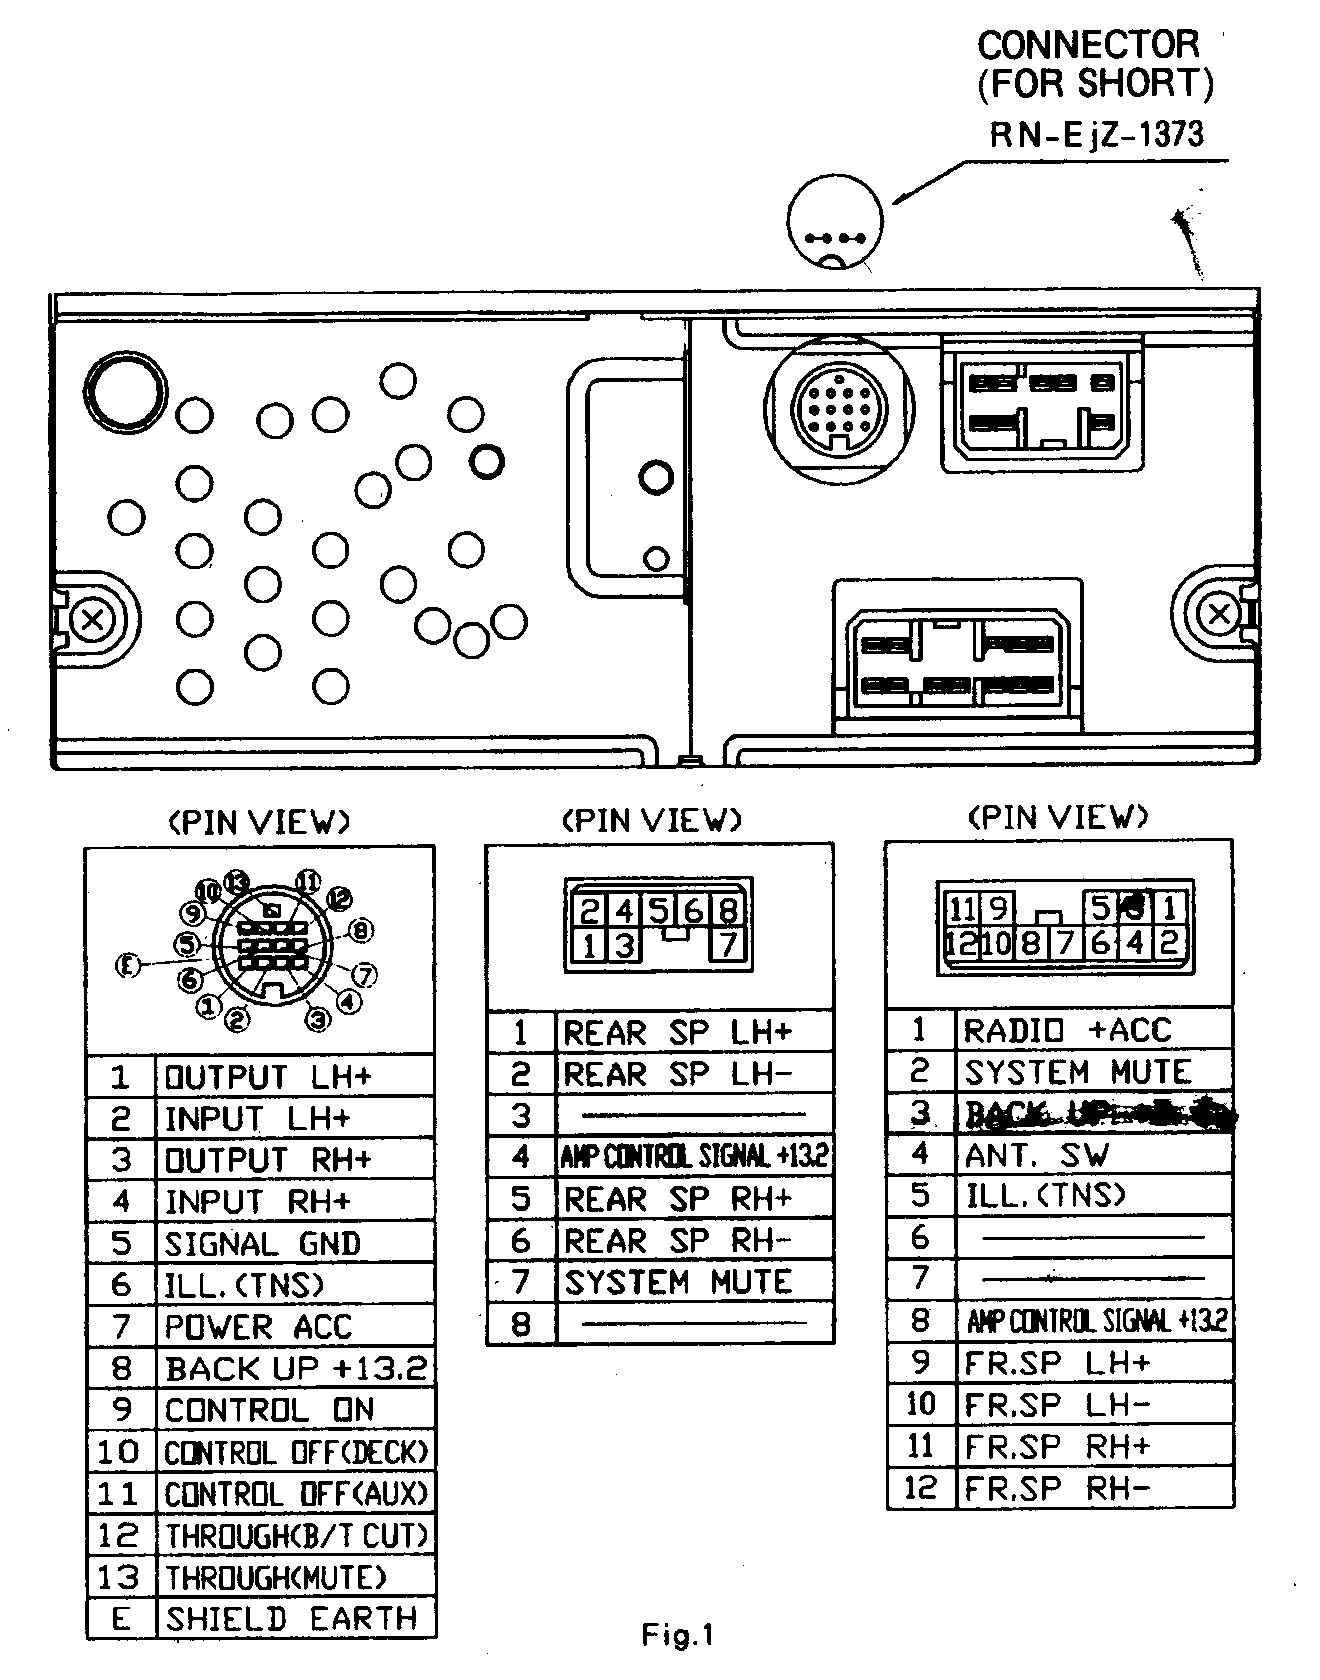 Free Wiring Diagram Clarion Dxz655mp - House Wiring Diagram Symbols •